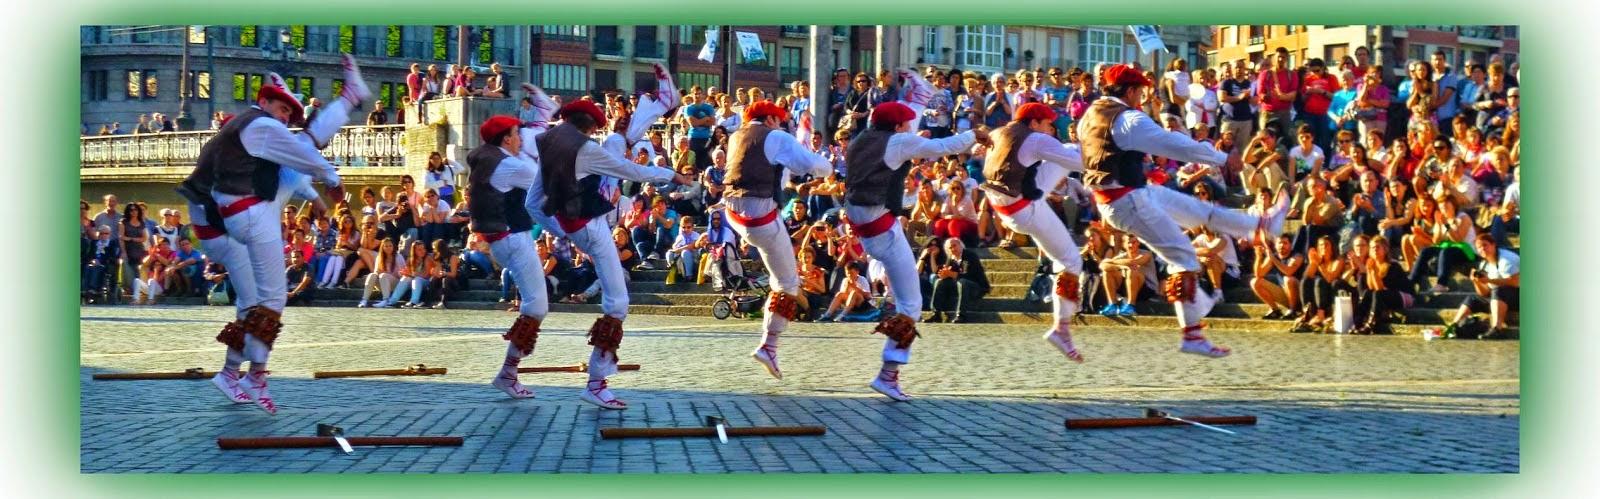 Resultat d'imatges de dantz-ango ezpata dantza